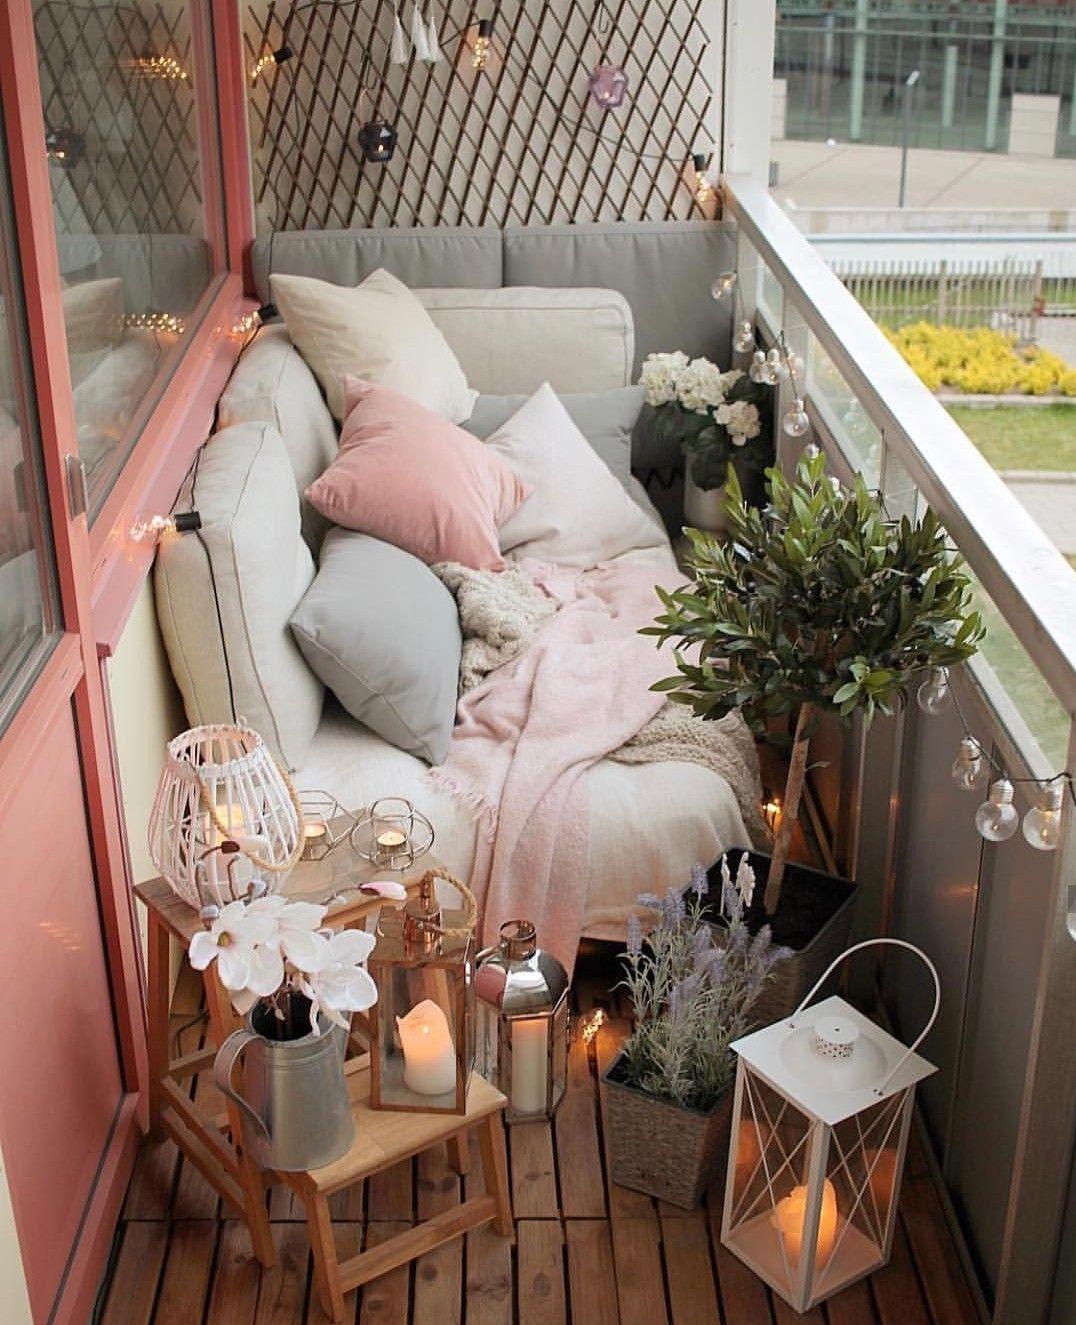 Home By Nat Instagram In 2019 Balkonentwurf Balkon